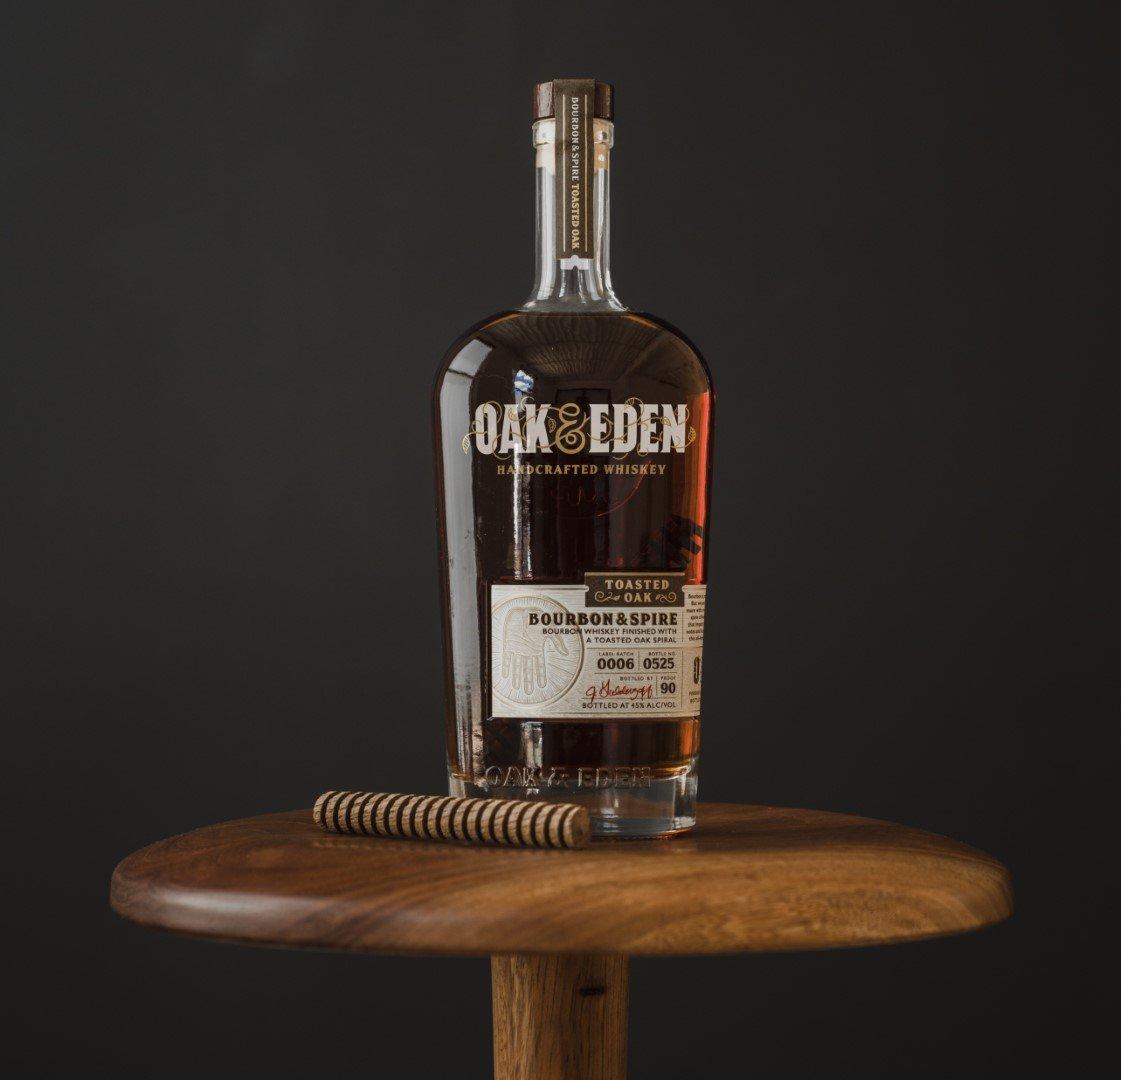 Oak & Eden Finished Whiskey - Rye & Rumba